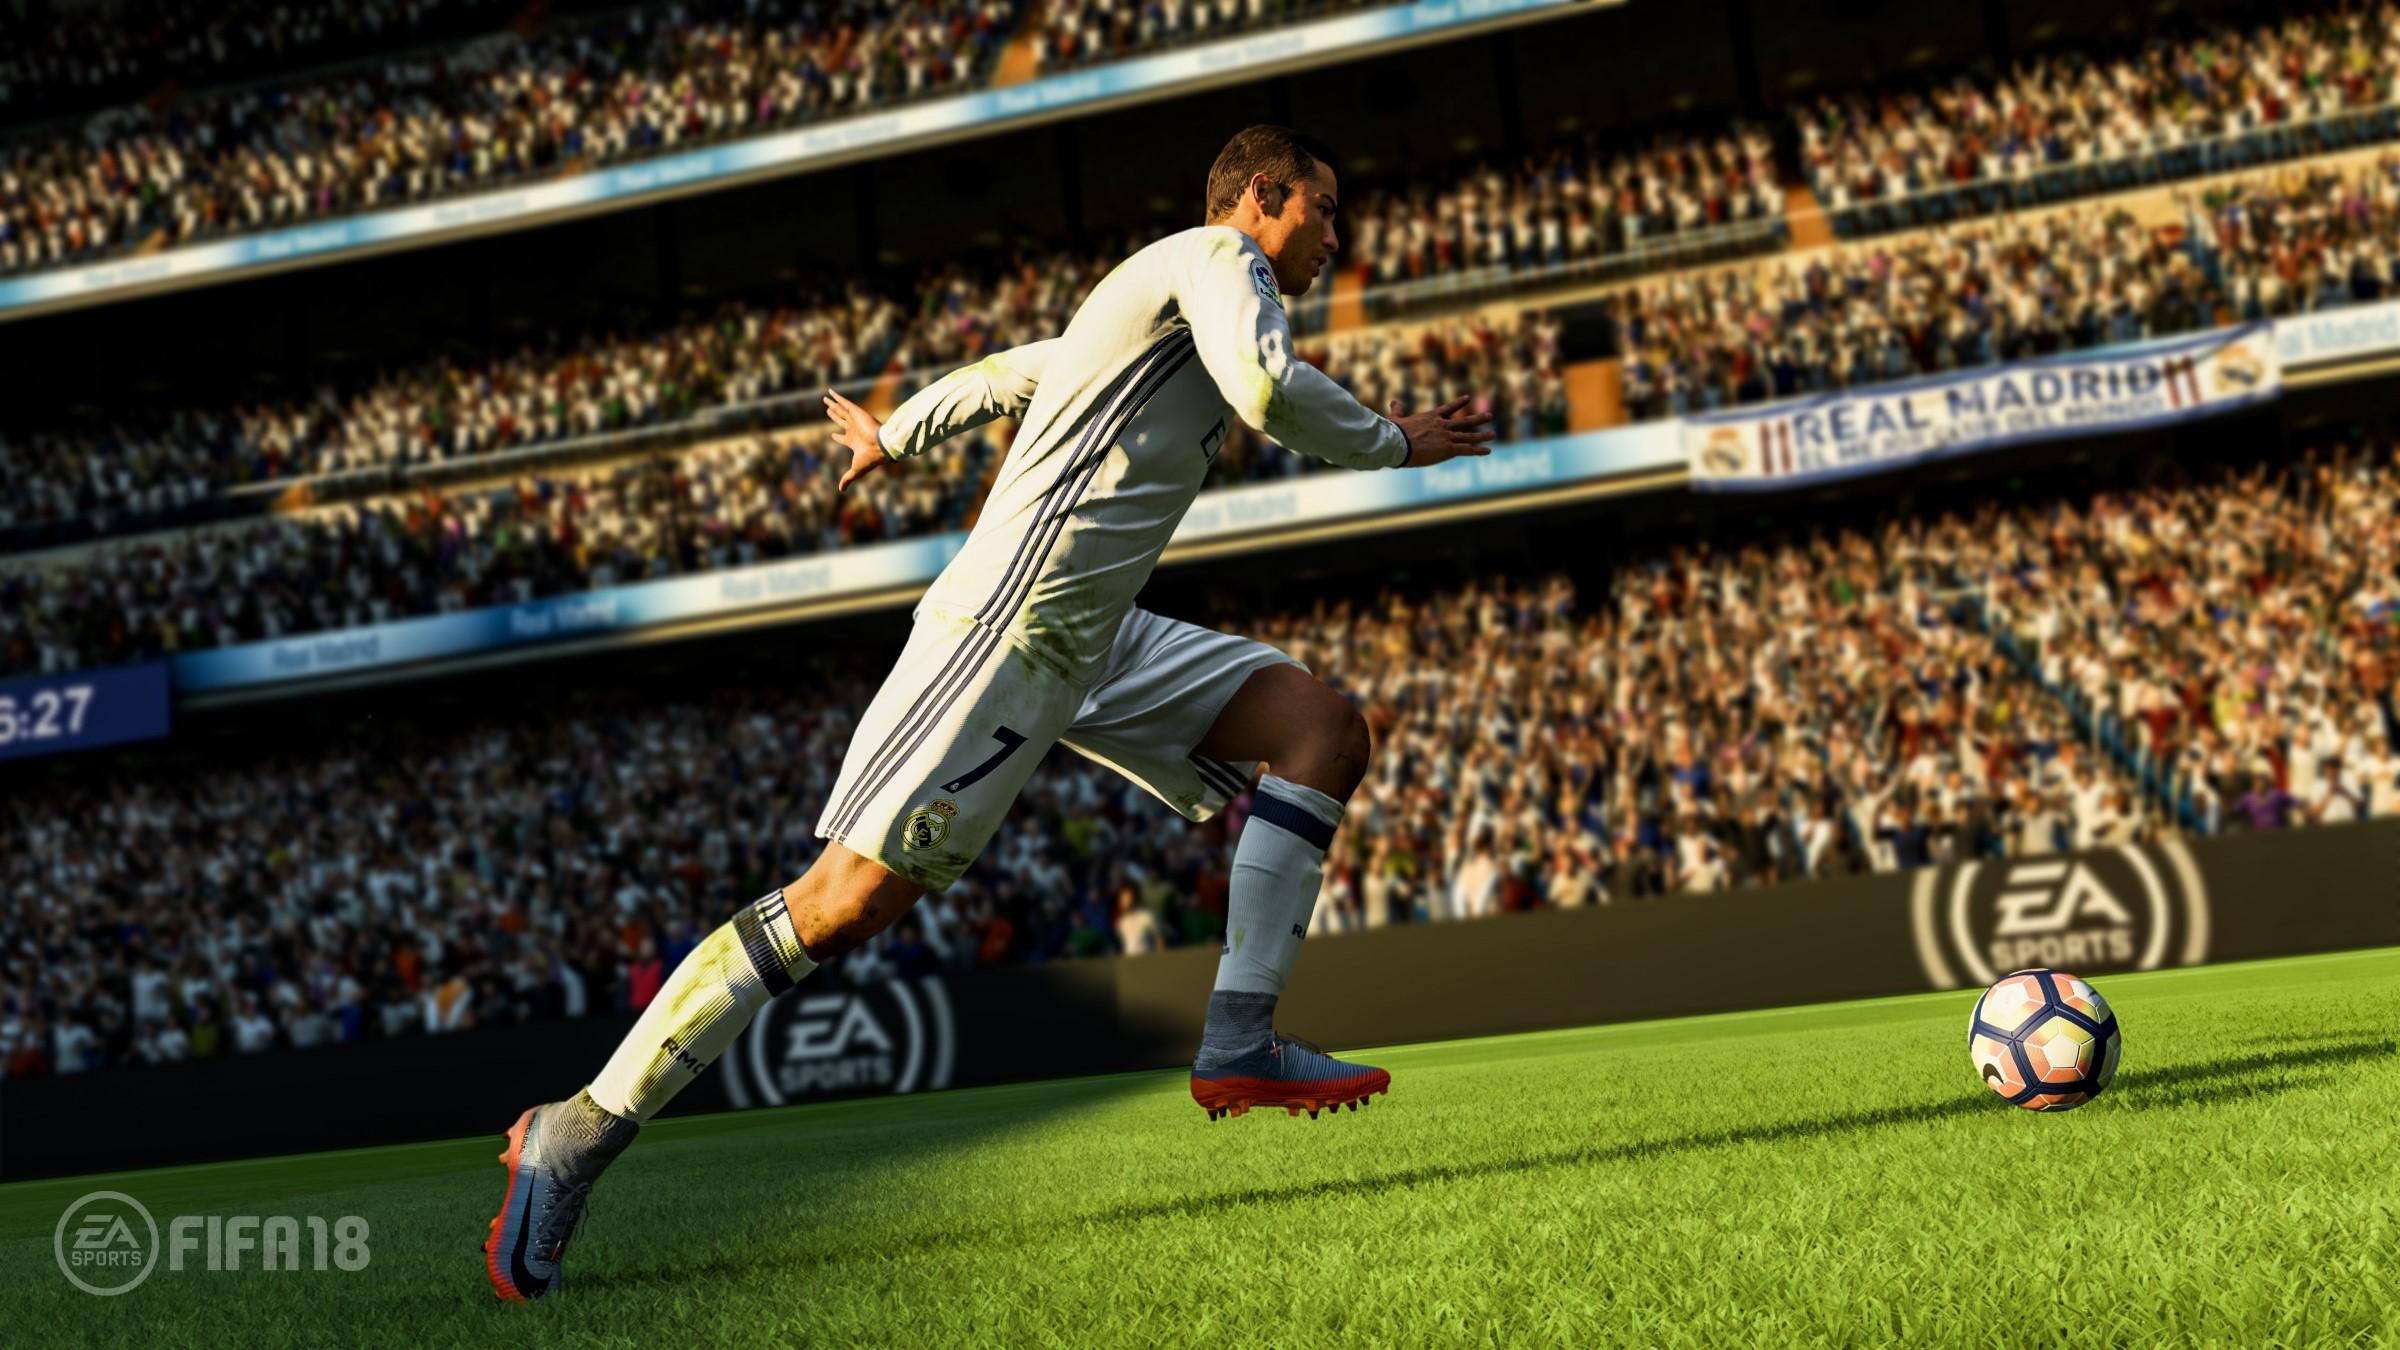 FIFA 18 RONALDO_GAMEPLAY_FULLRES_WM